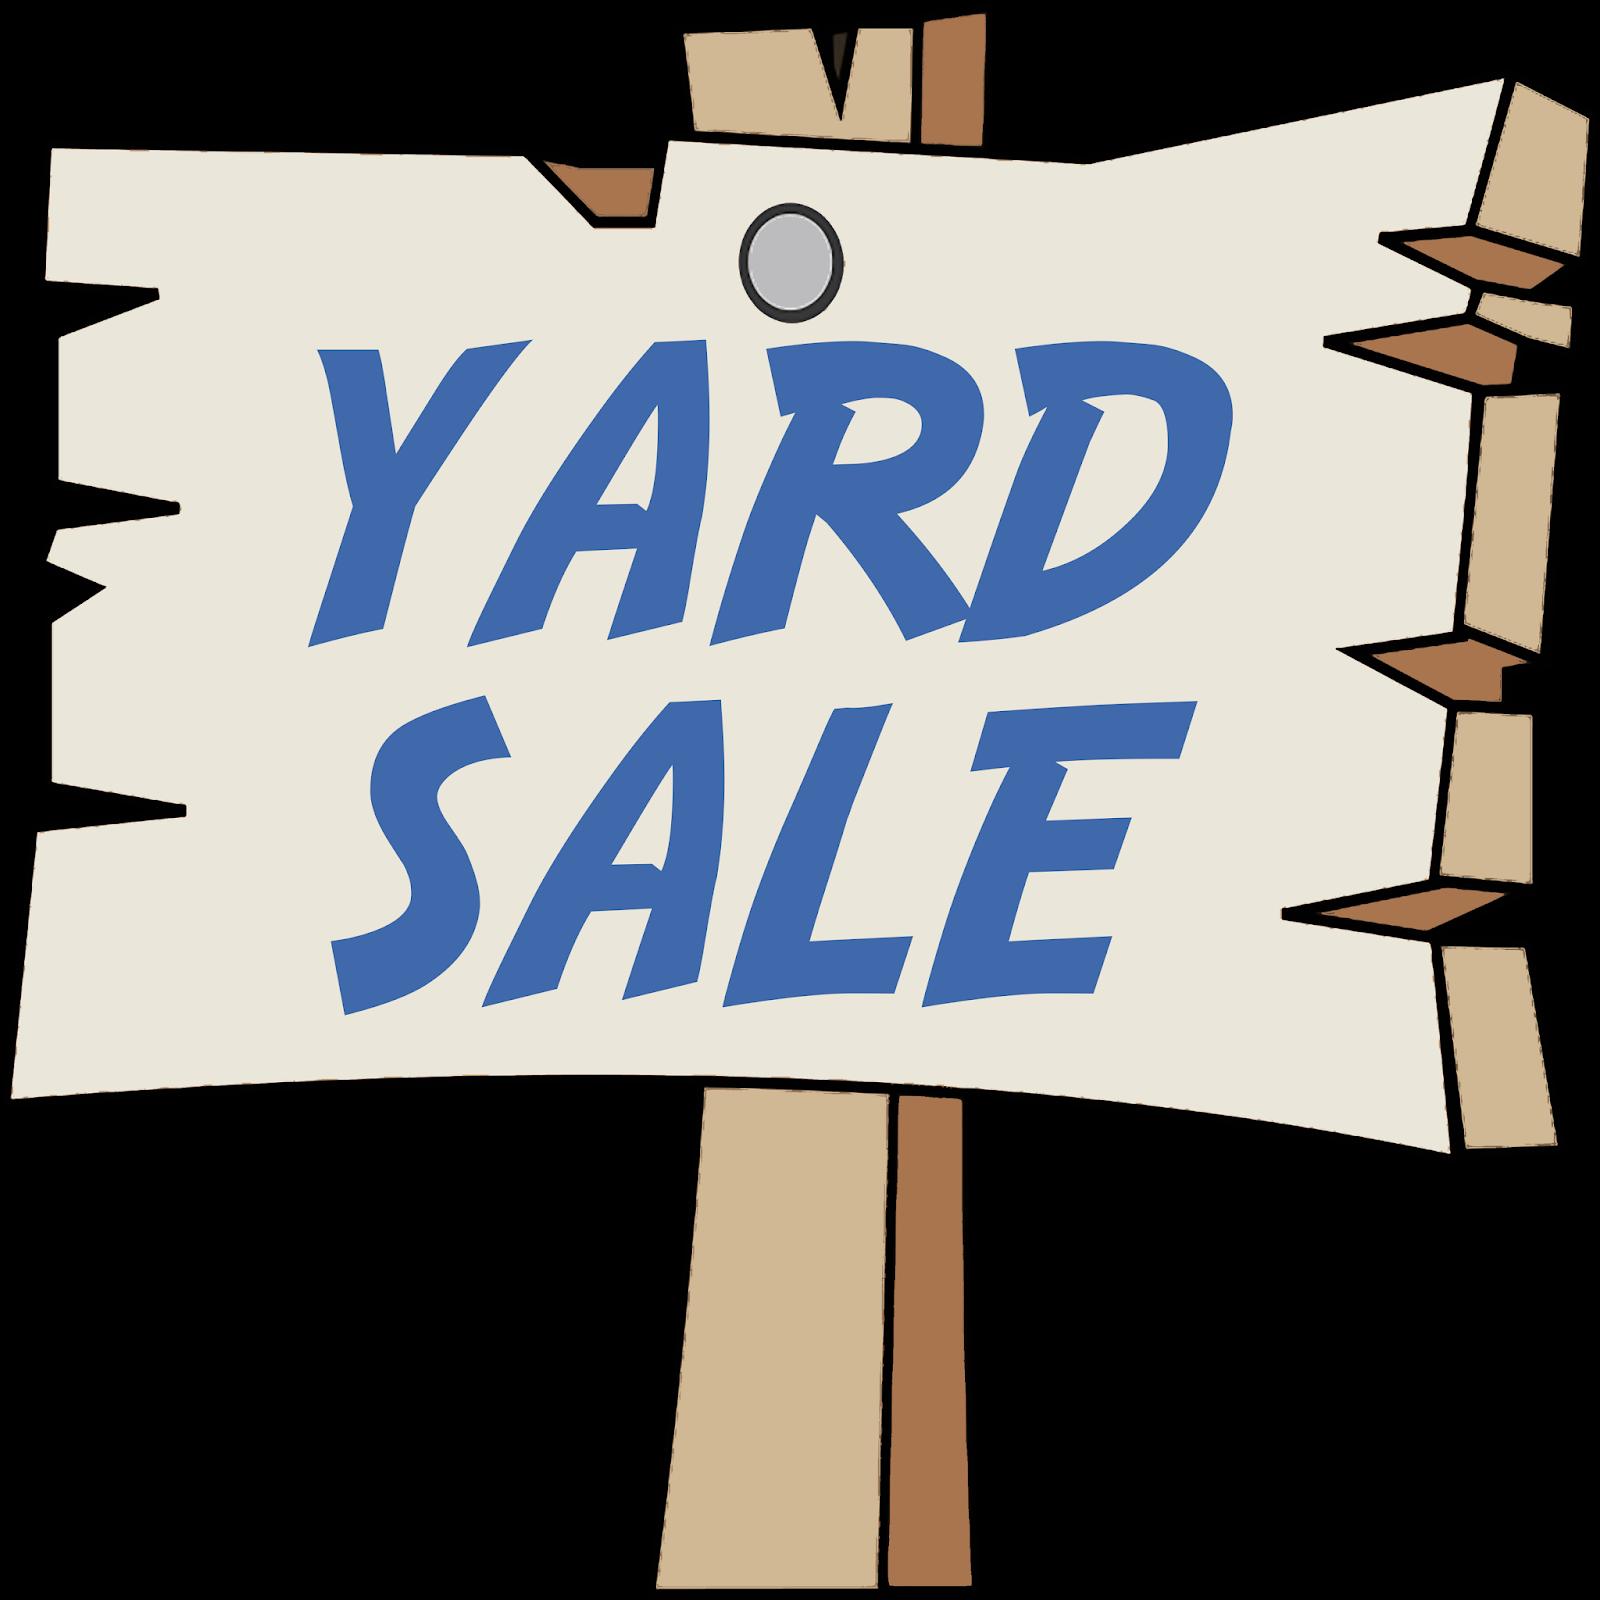 Free Garage Sale Images Yard Sale Clip Art Okc Craigslist Garage Sales Oklahoma City